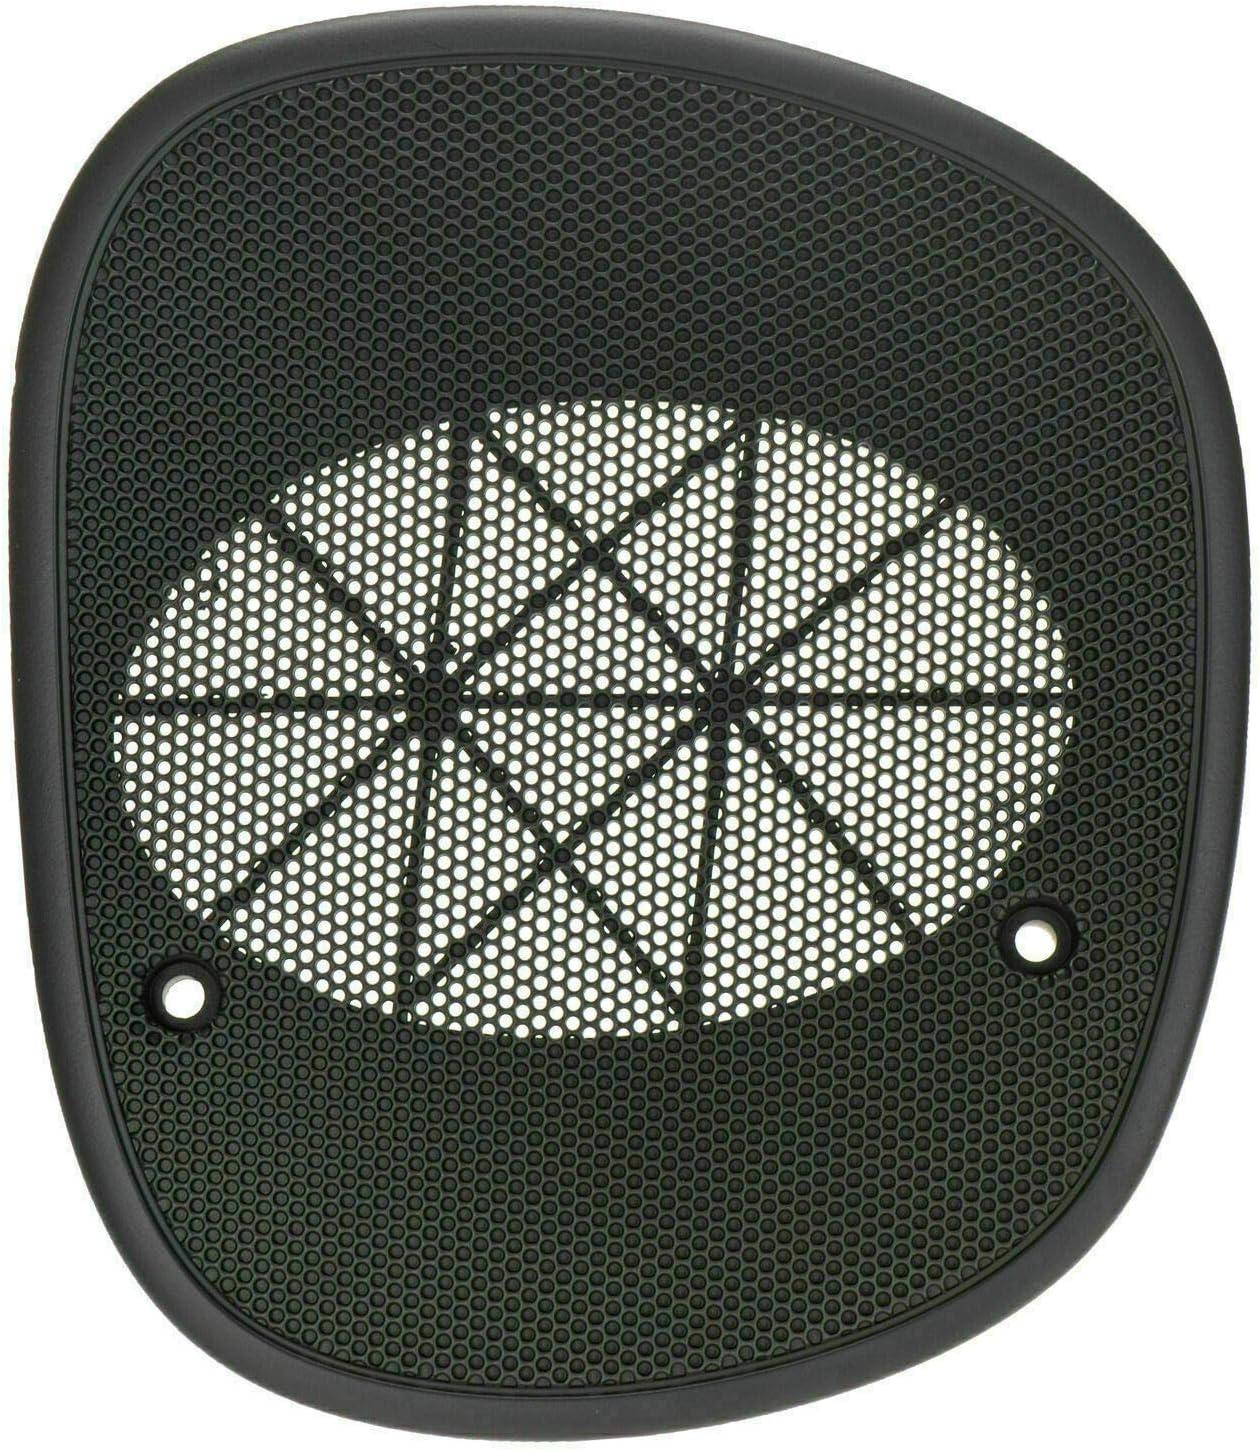 98-05 Chevrolet S-10 Blazer LH Driver Graphite Dash Speaker GRILLE COVER new OEM